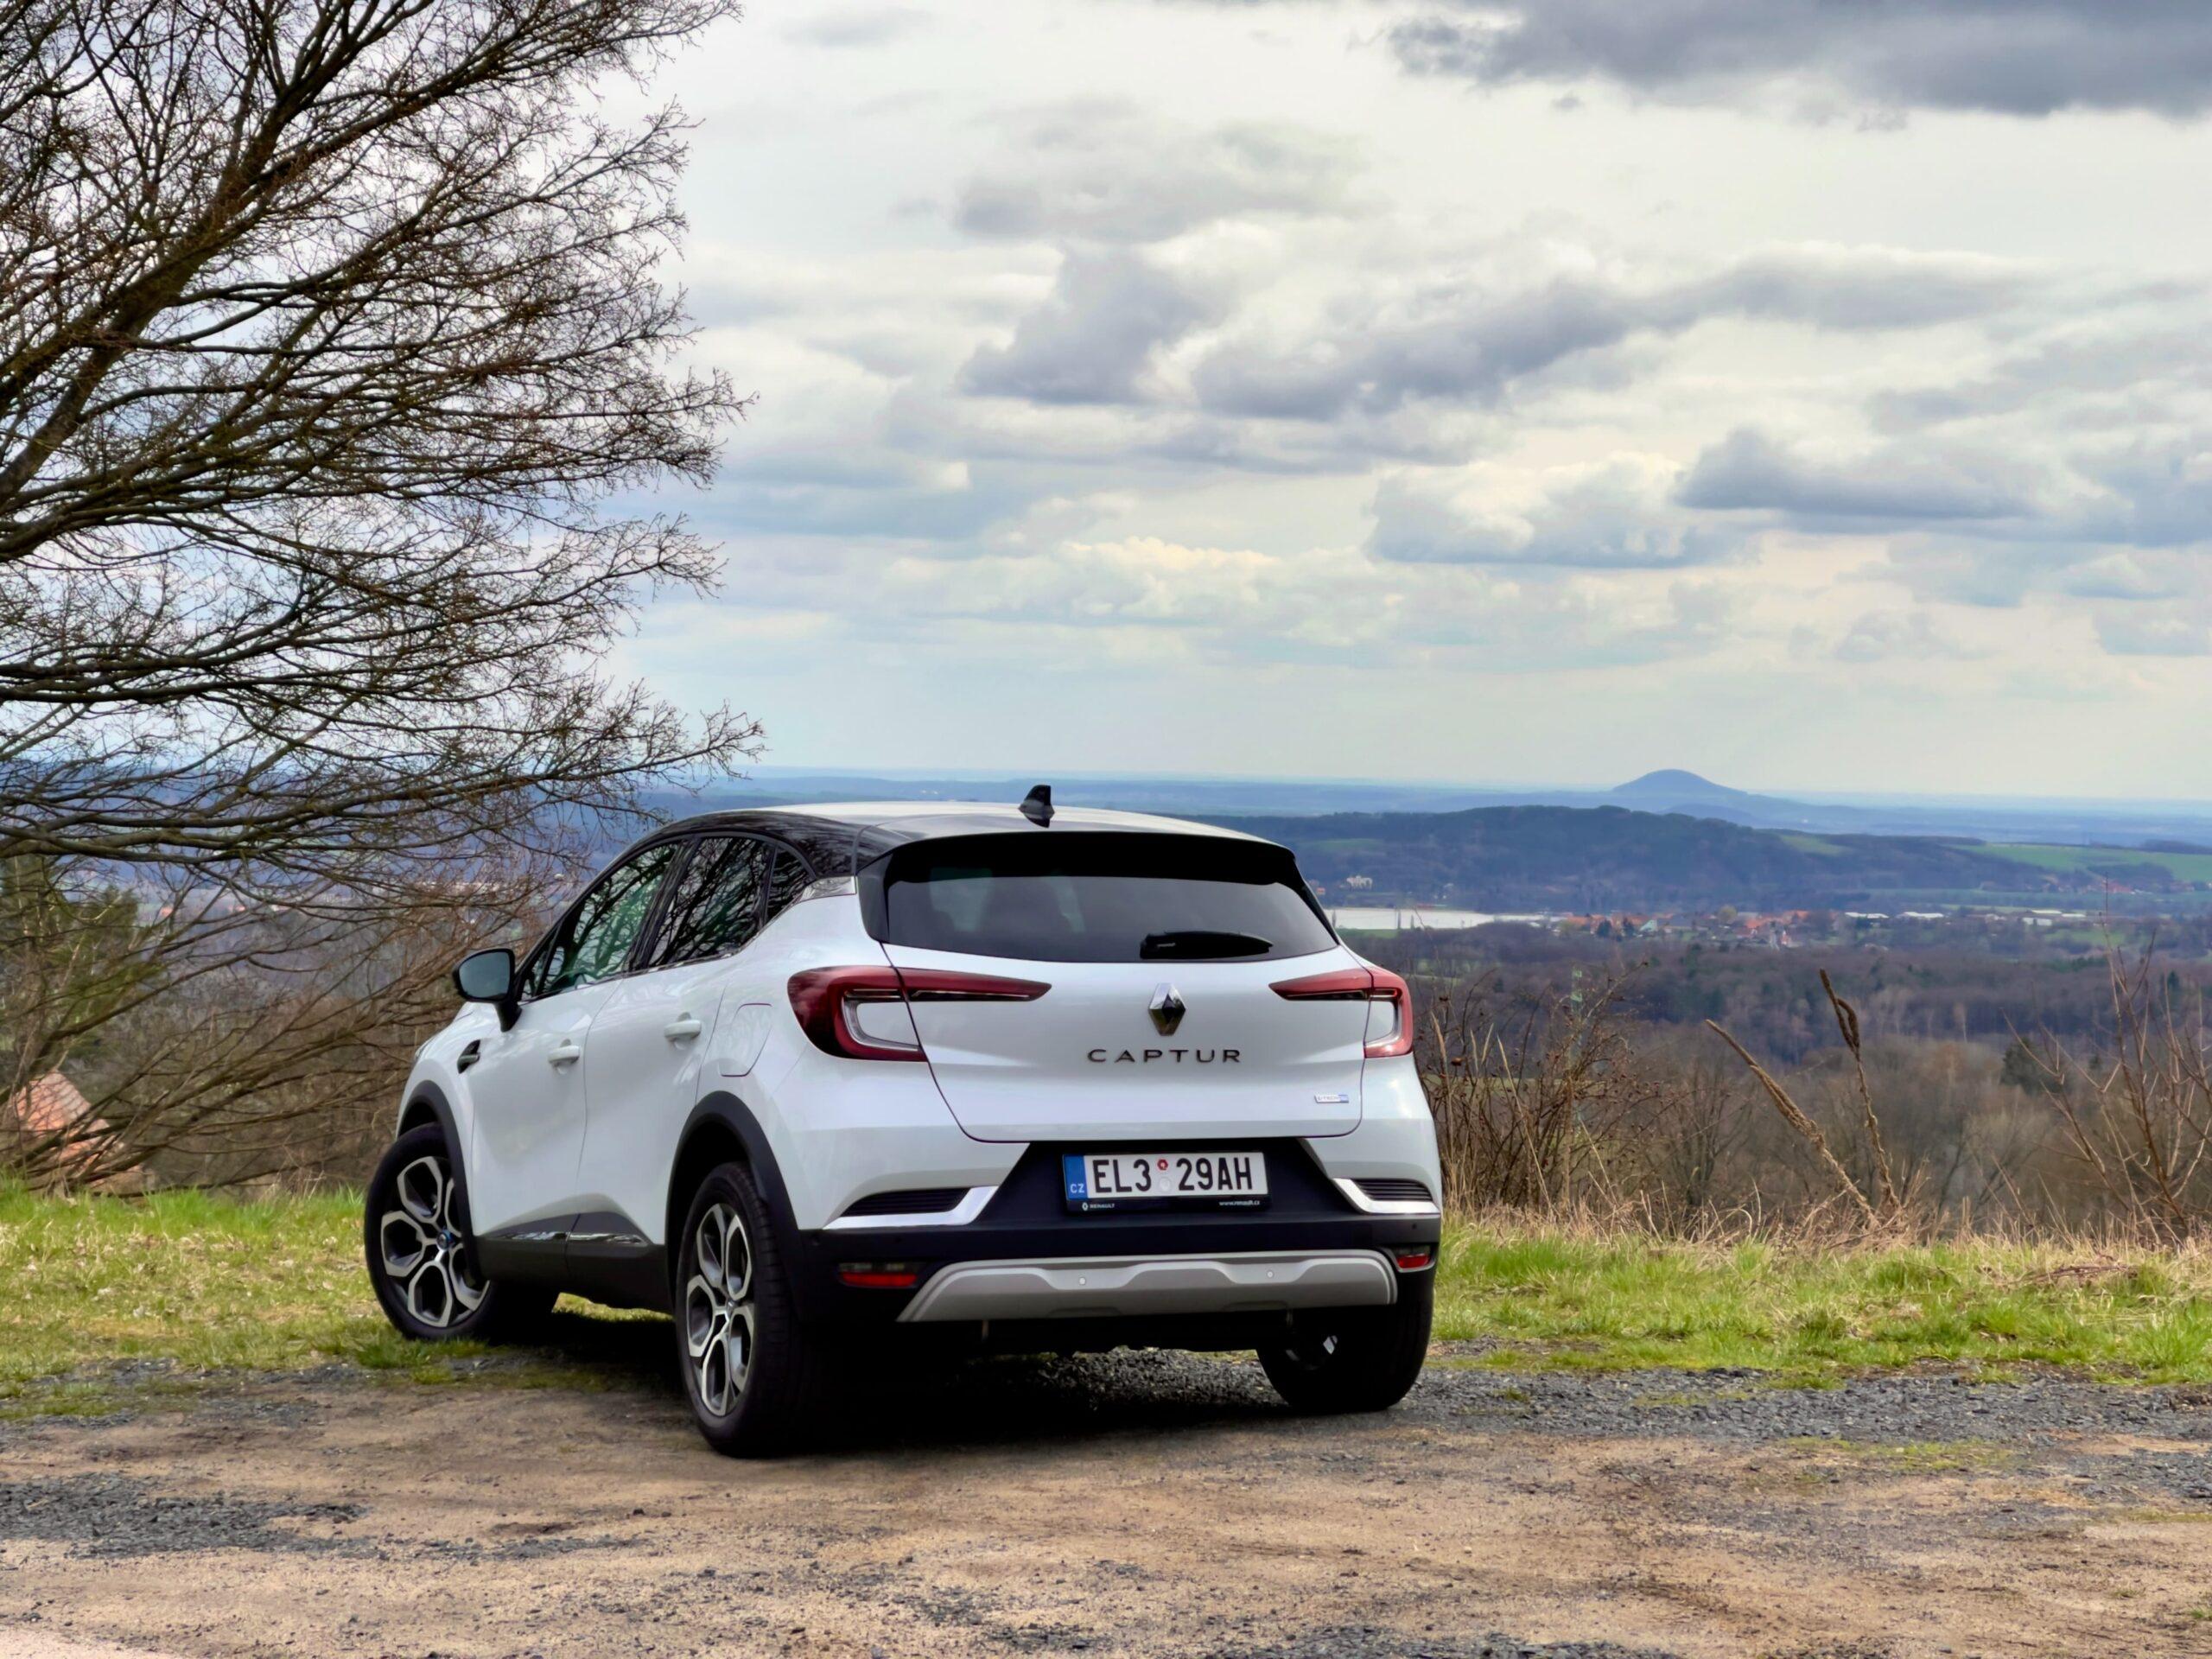 Renault_Captur_Exterior_2